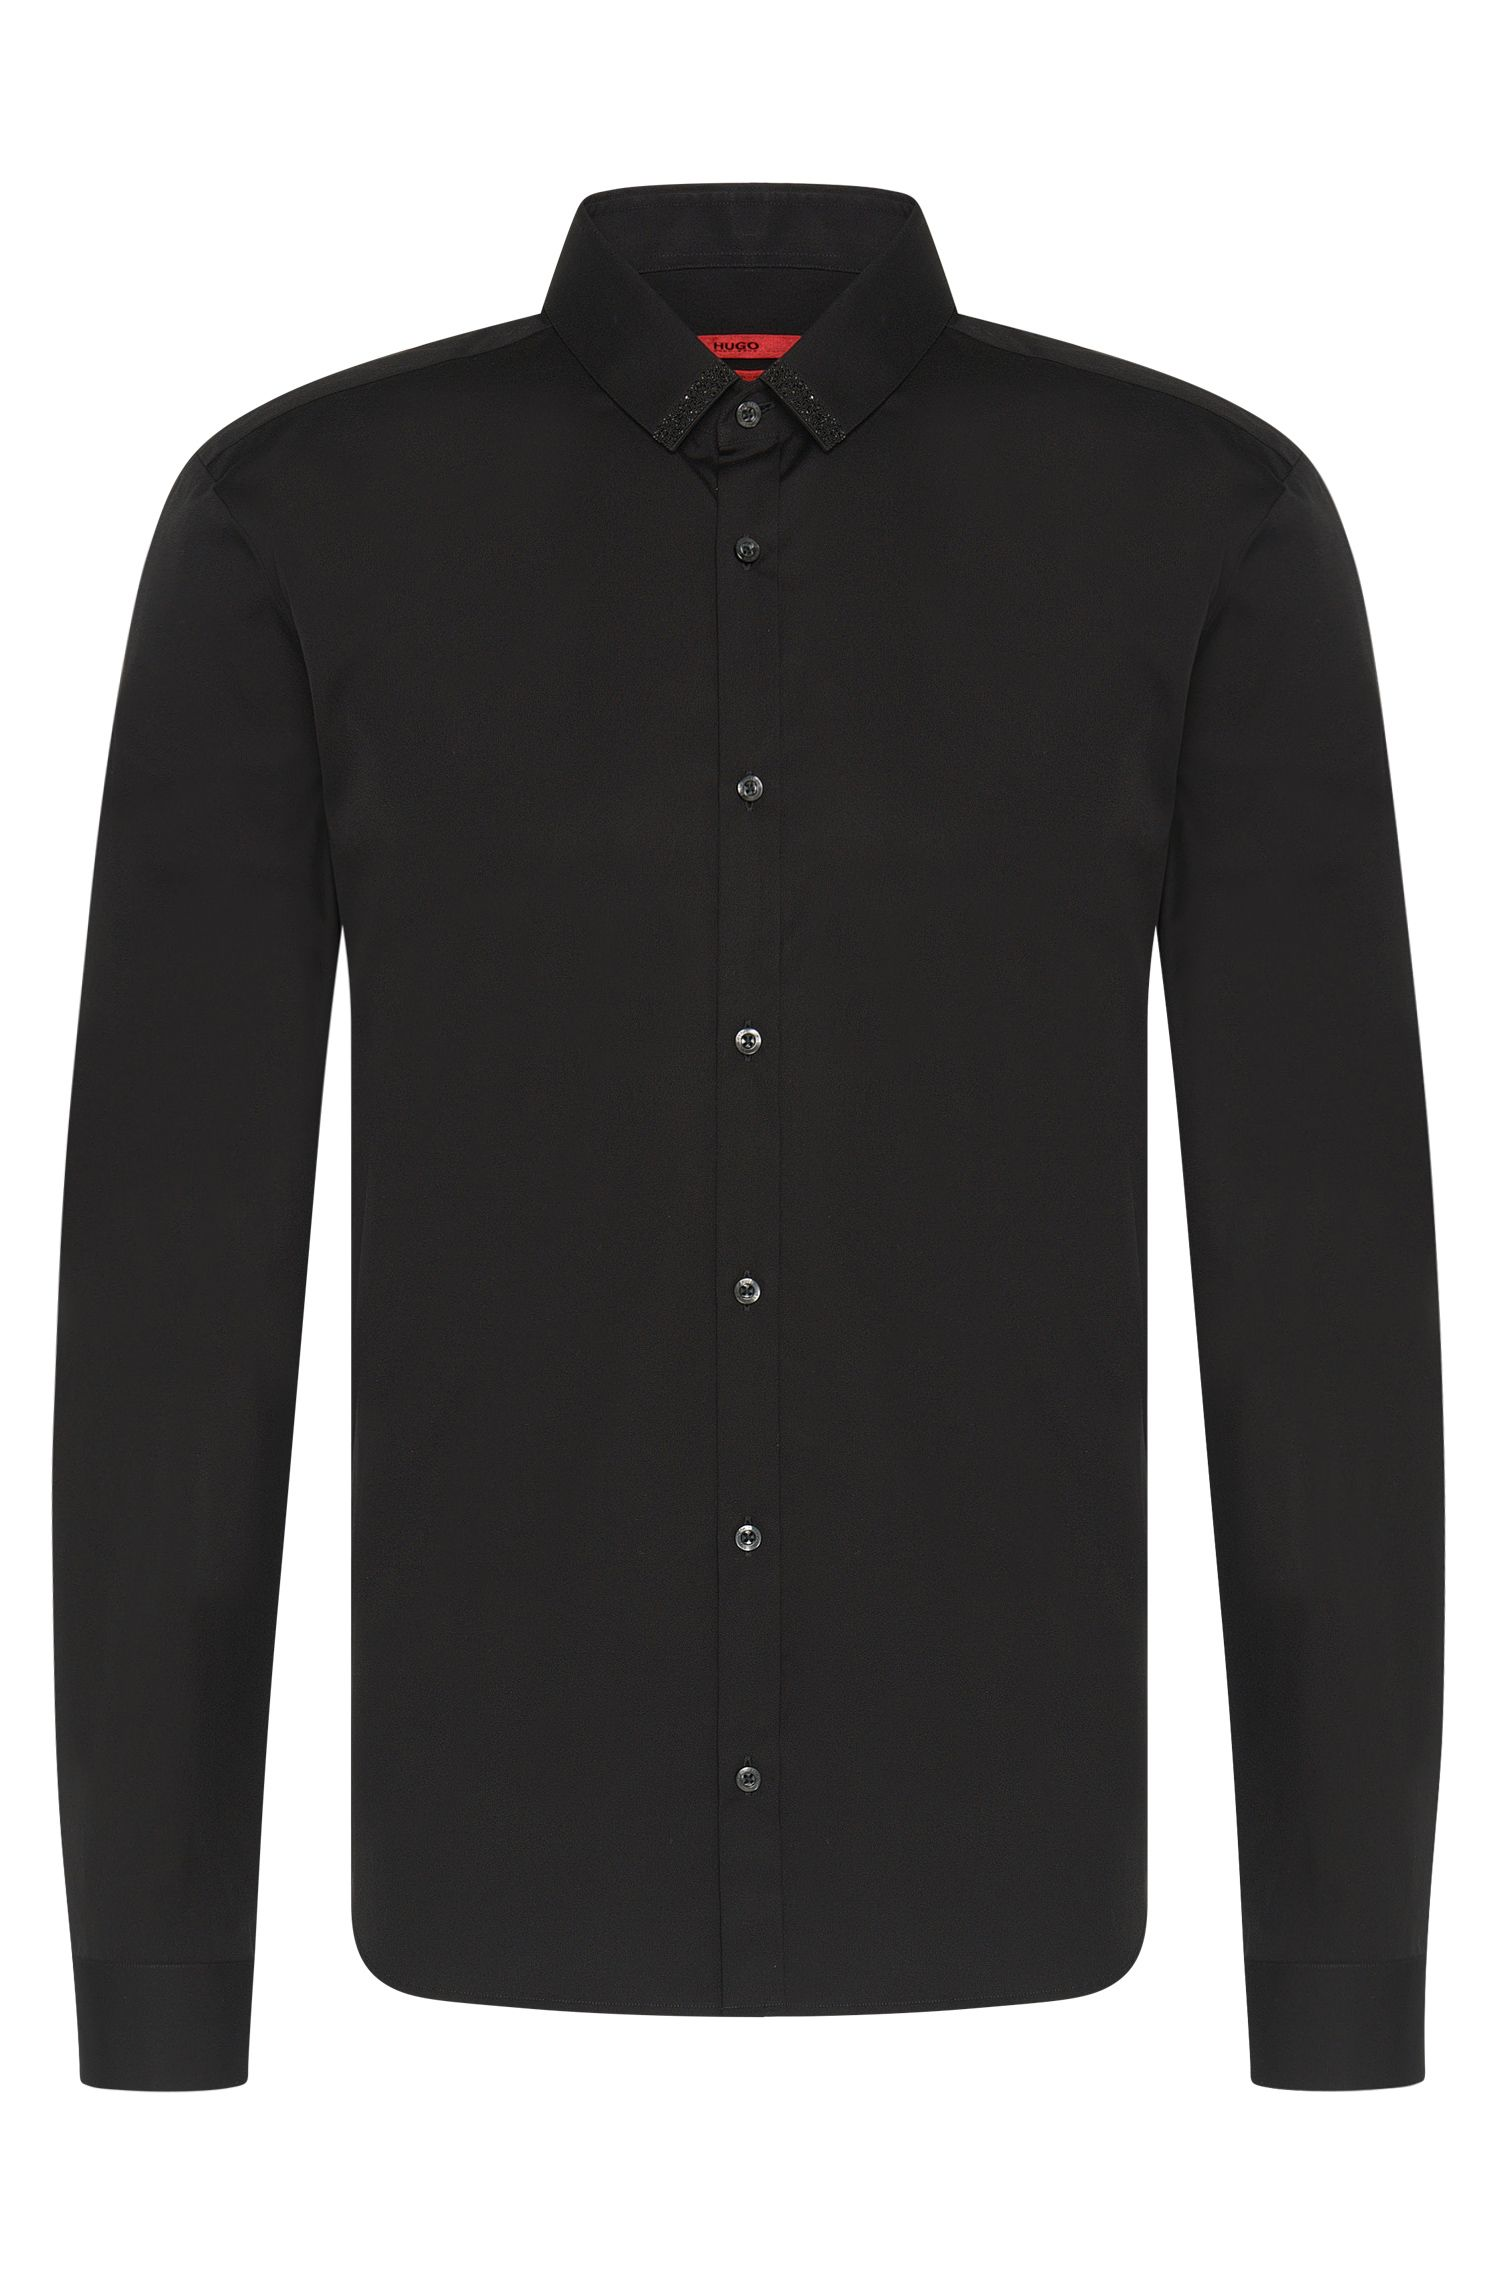 'Ero' | Slim Fit, Stretch Cotton Swarovski Button Down Shirt